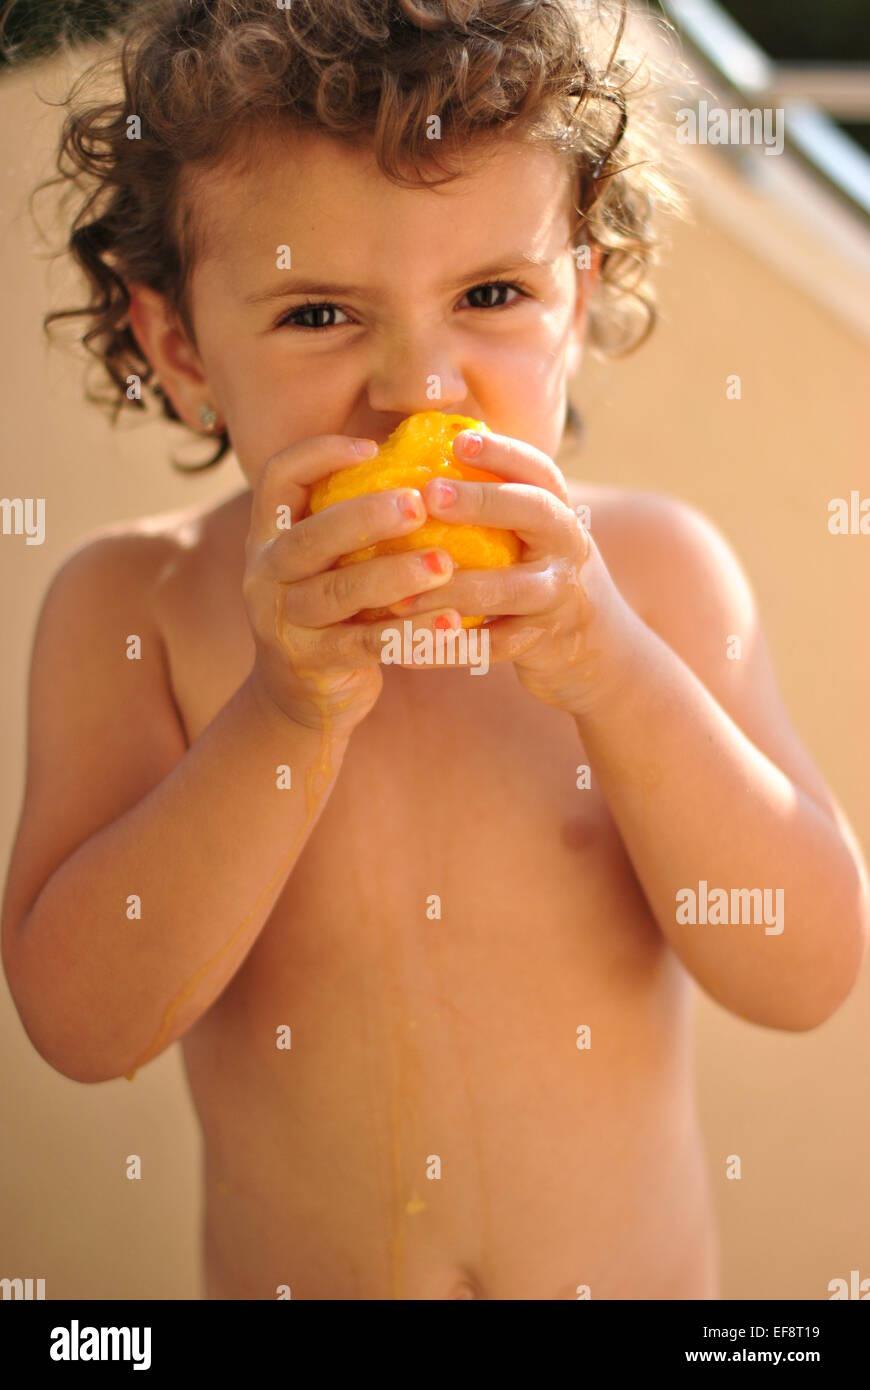 Portrait of girl (2-3) eating peach - Stock Image